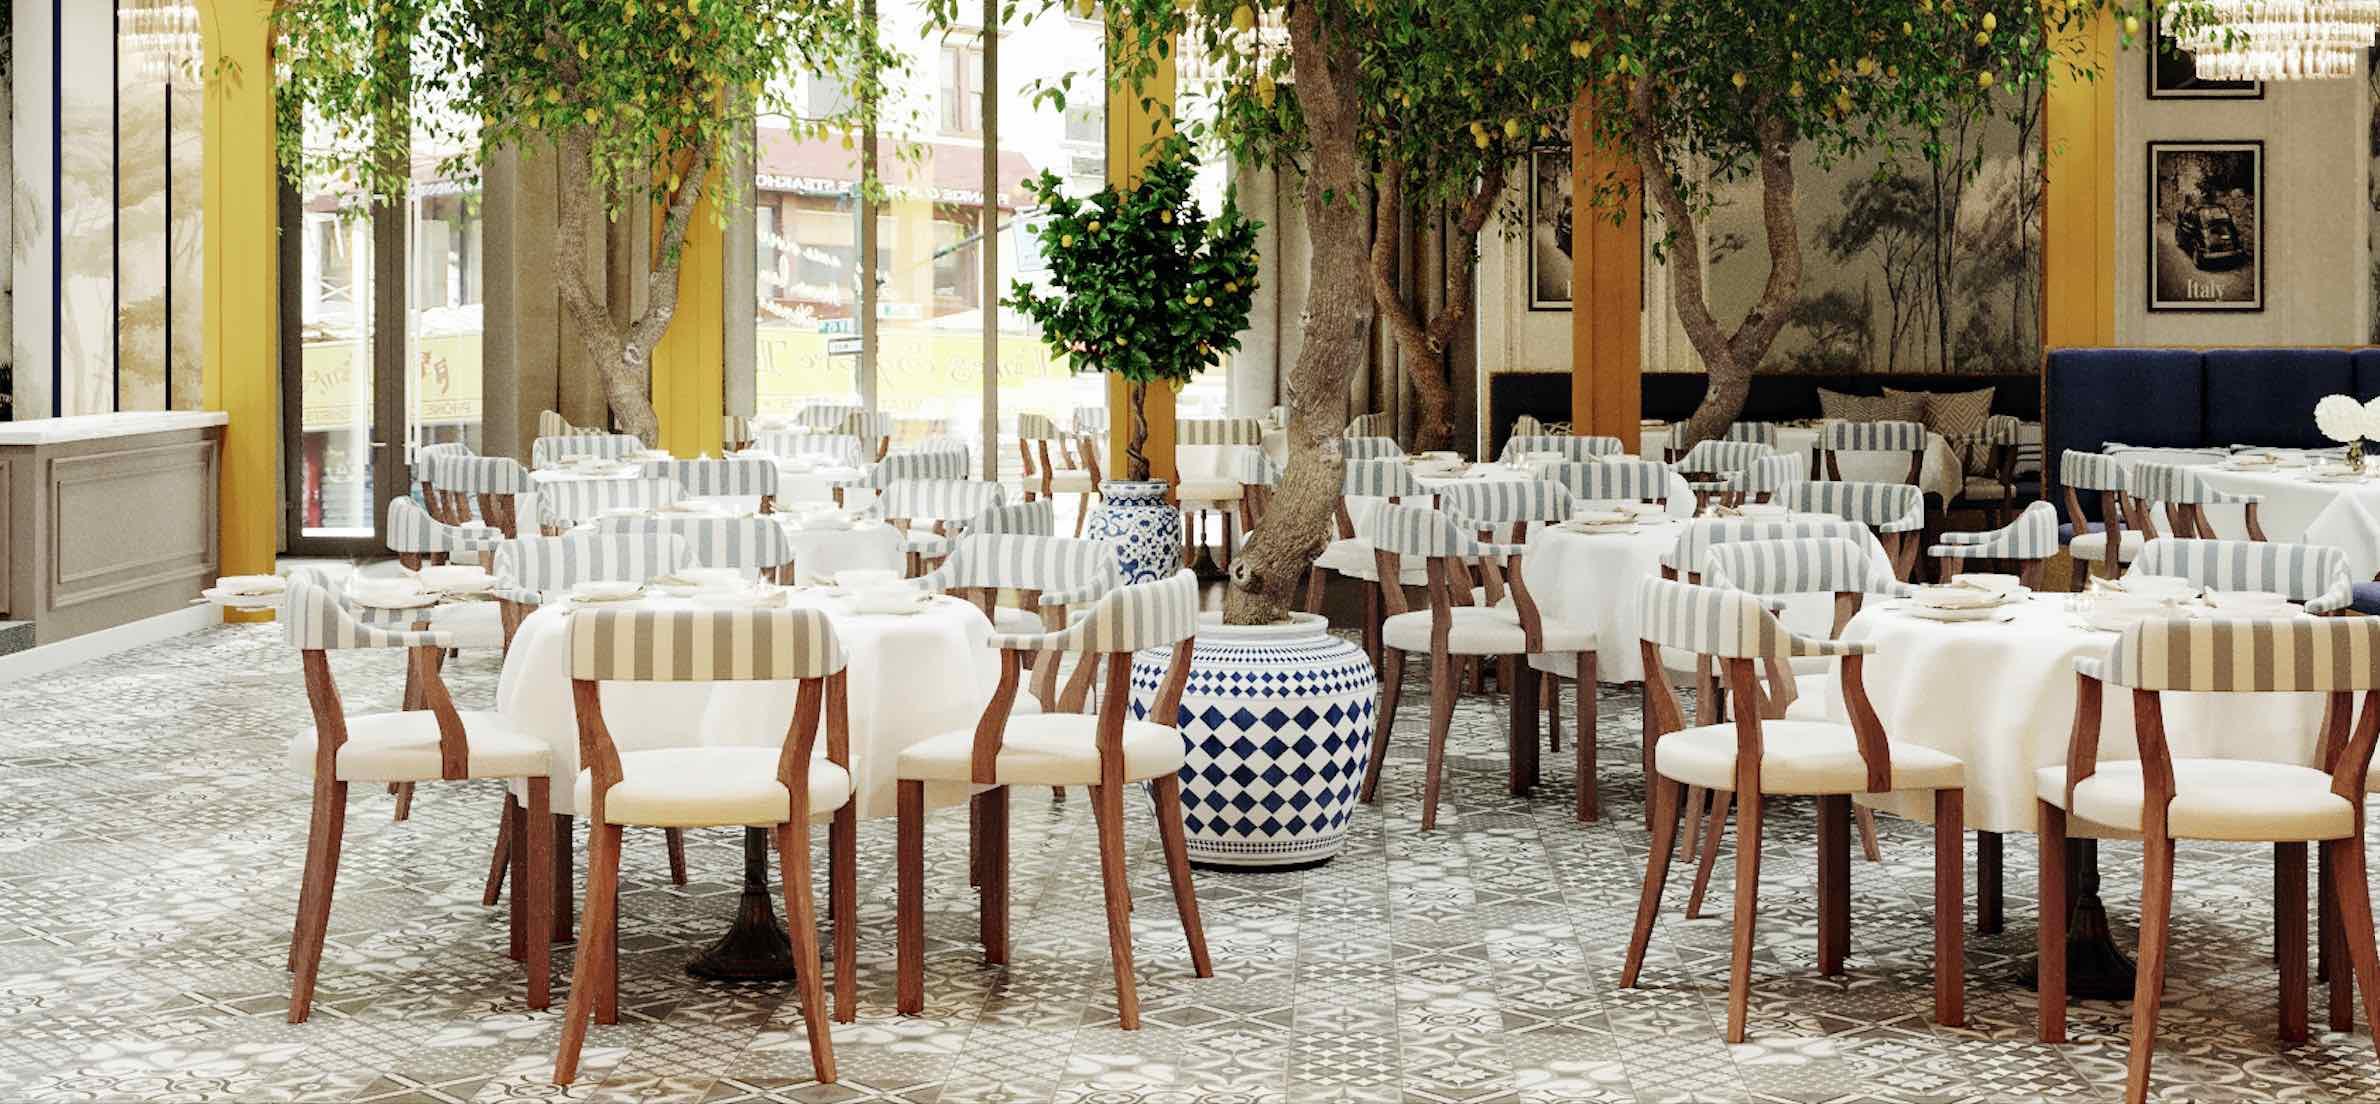 fact-first-look:-mura-italian-restaurant